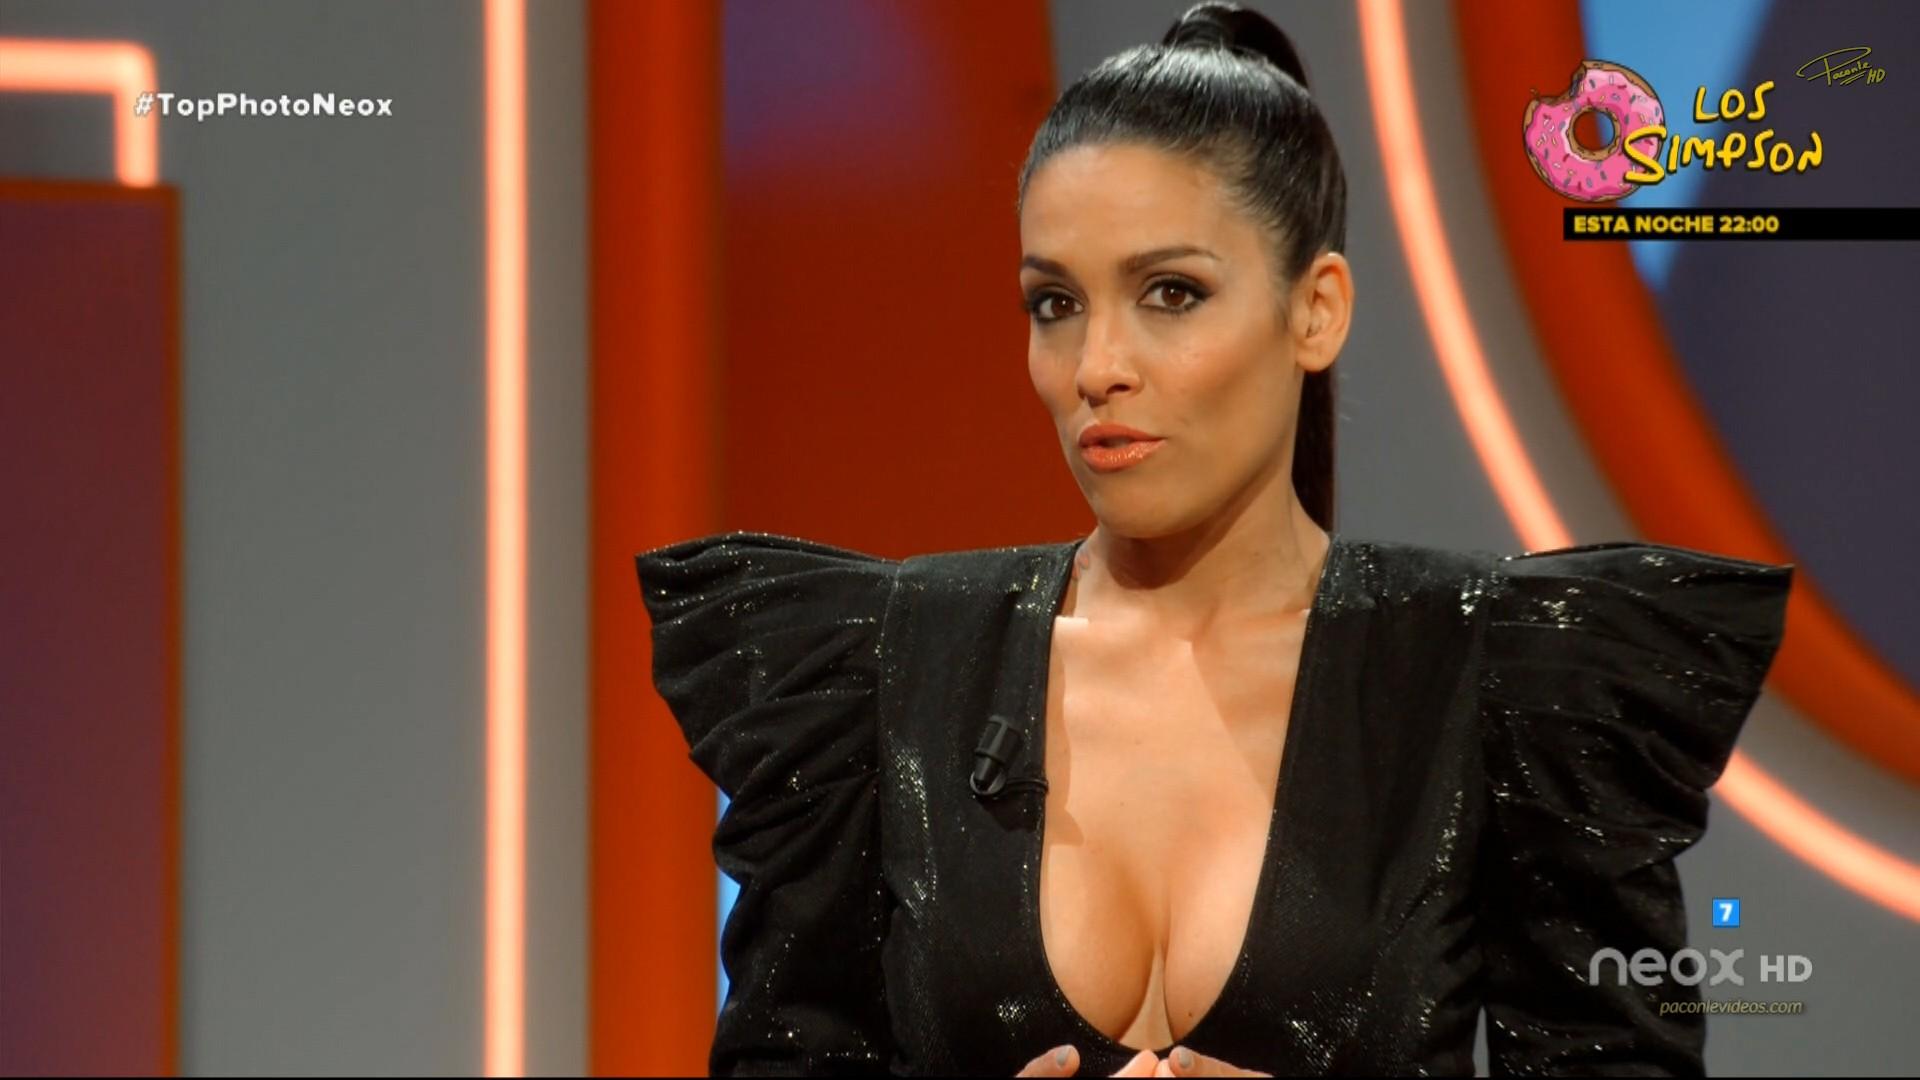 Lorena Castell Pechos Operados Presentadora Show Televisivo